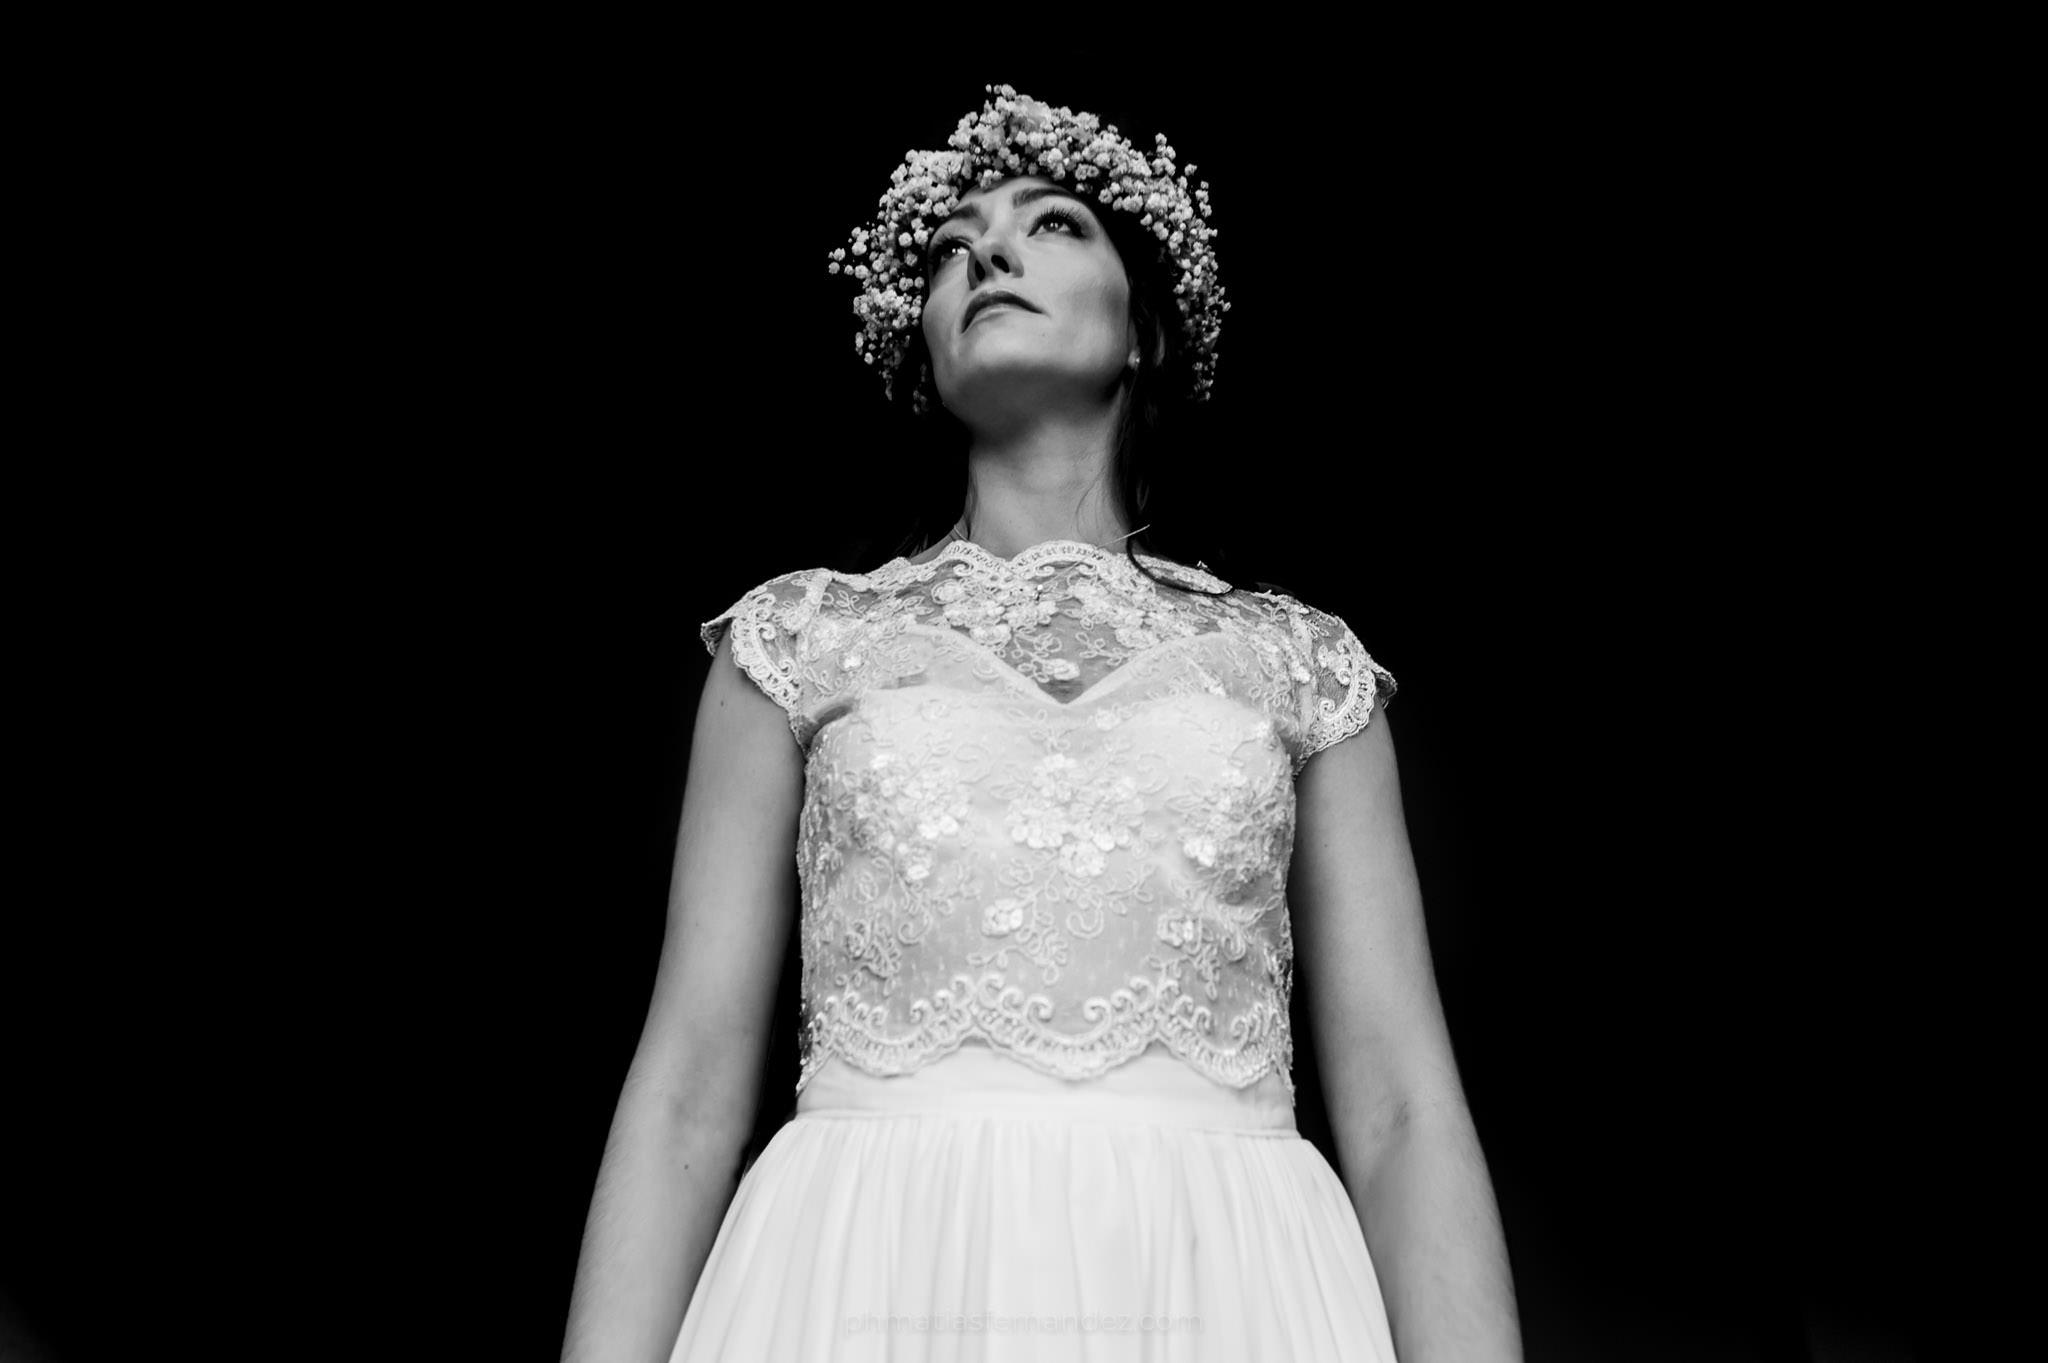 Boda Guada & Fran - phmatiasfernandez - matias fernandez - fotografo de bodas